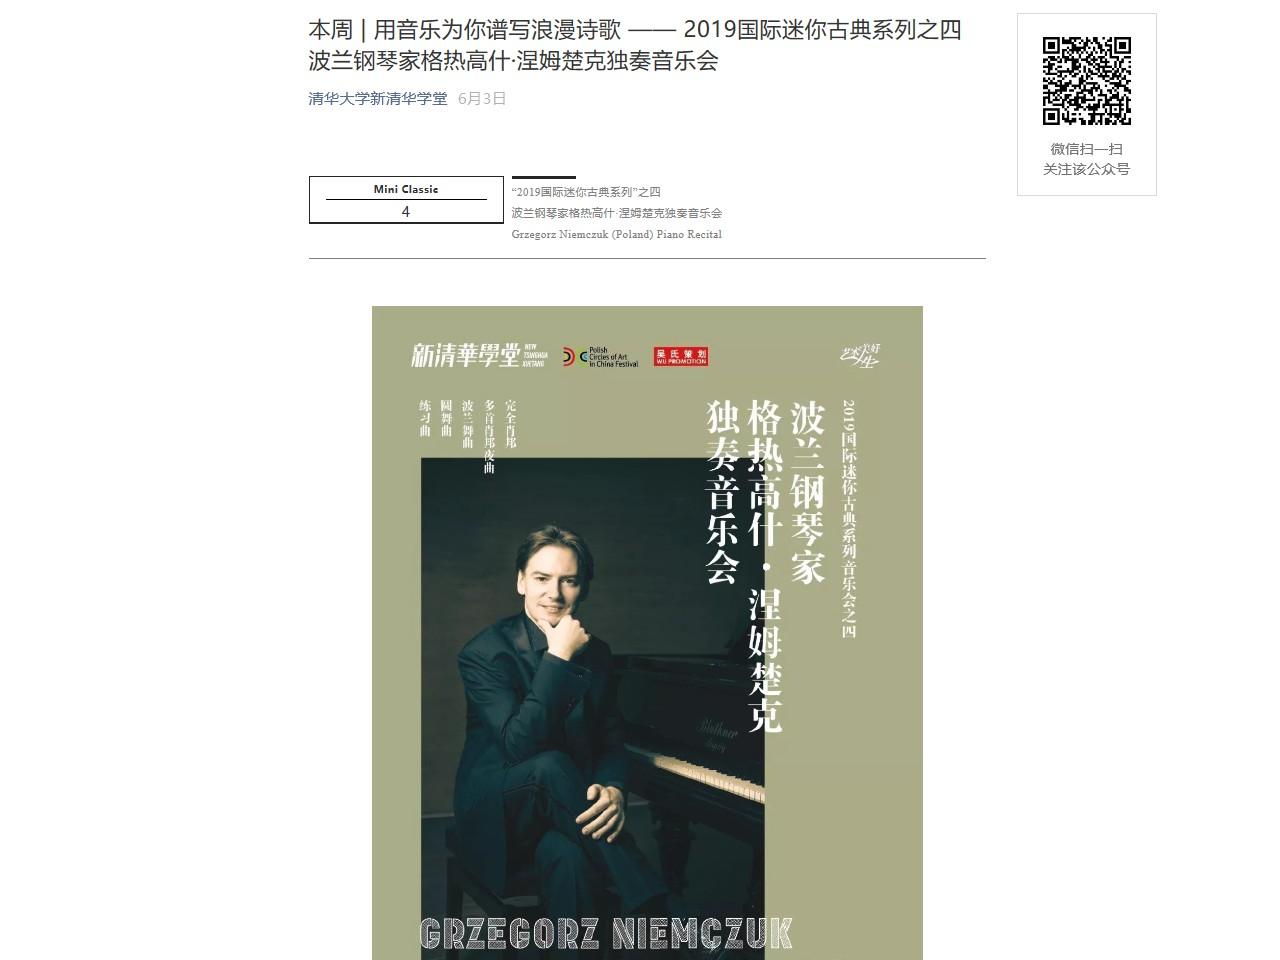 20190603_mp.weixin.qq.com